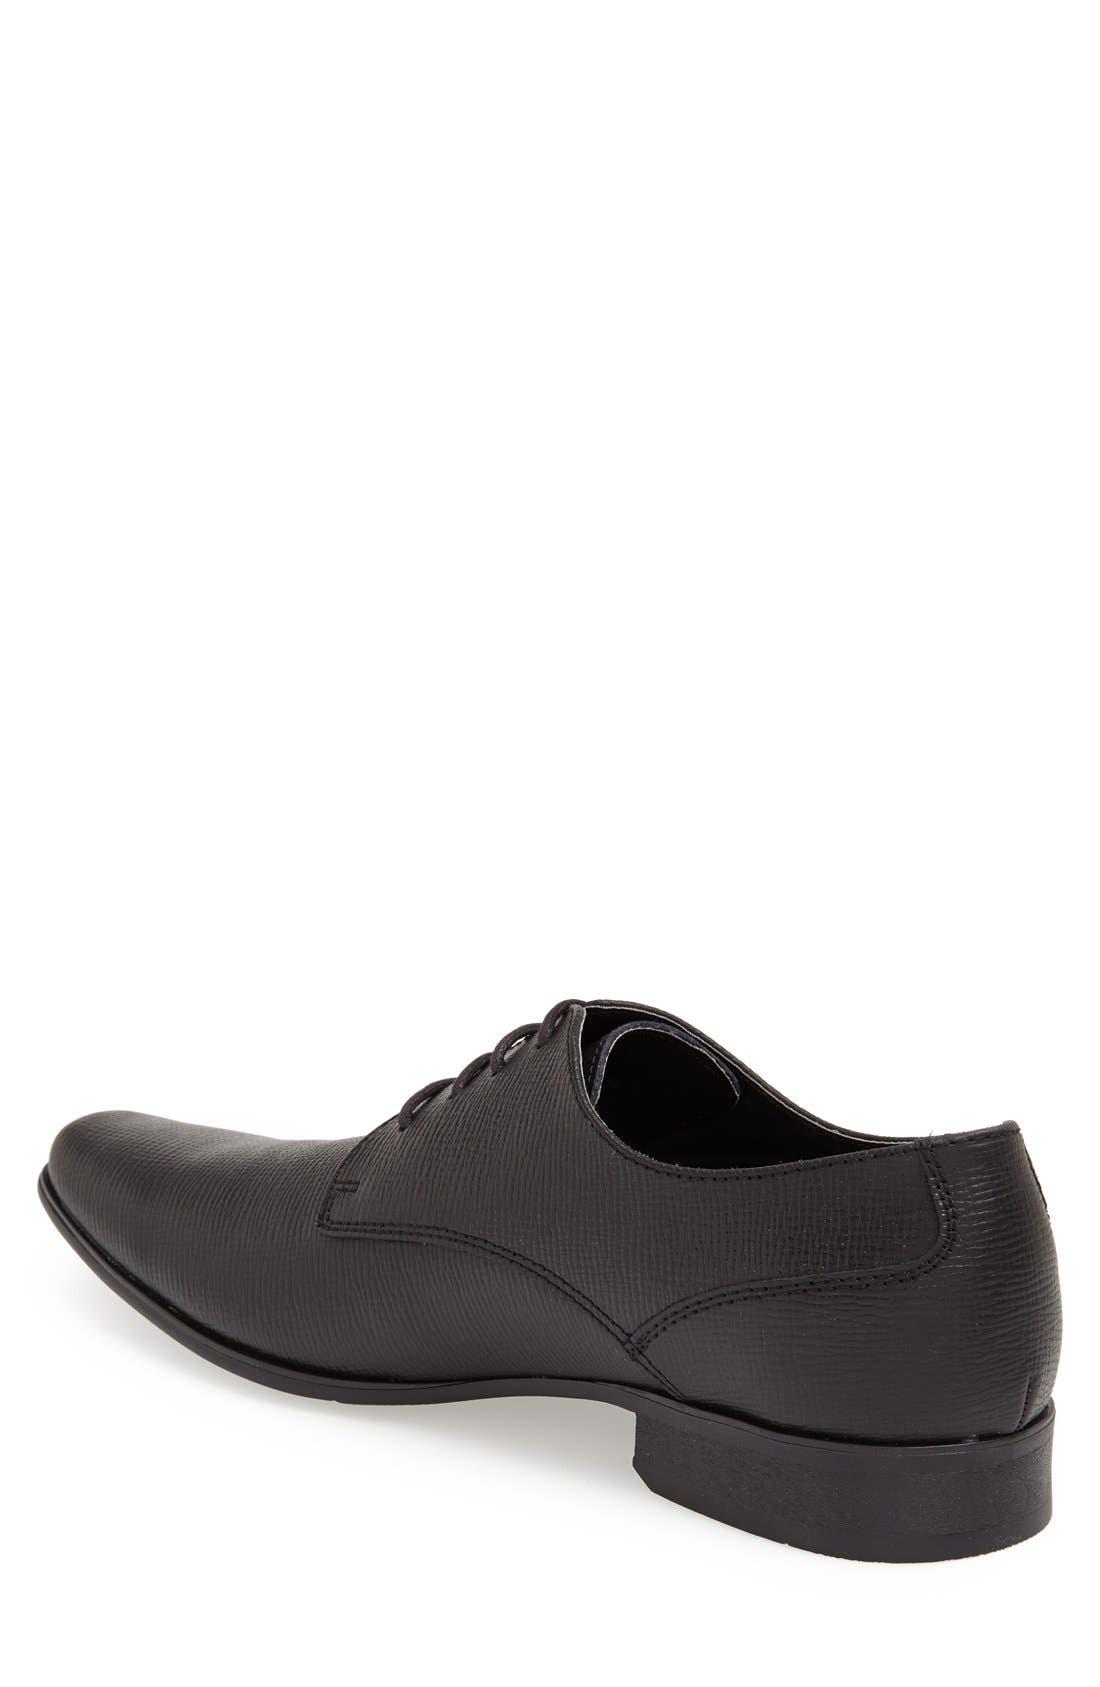 'Brodie' Plain Toe Derby,                             Alternate thumbnail 2, color,                             BLACK